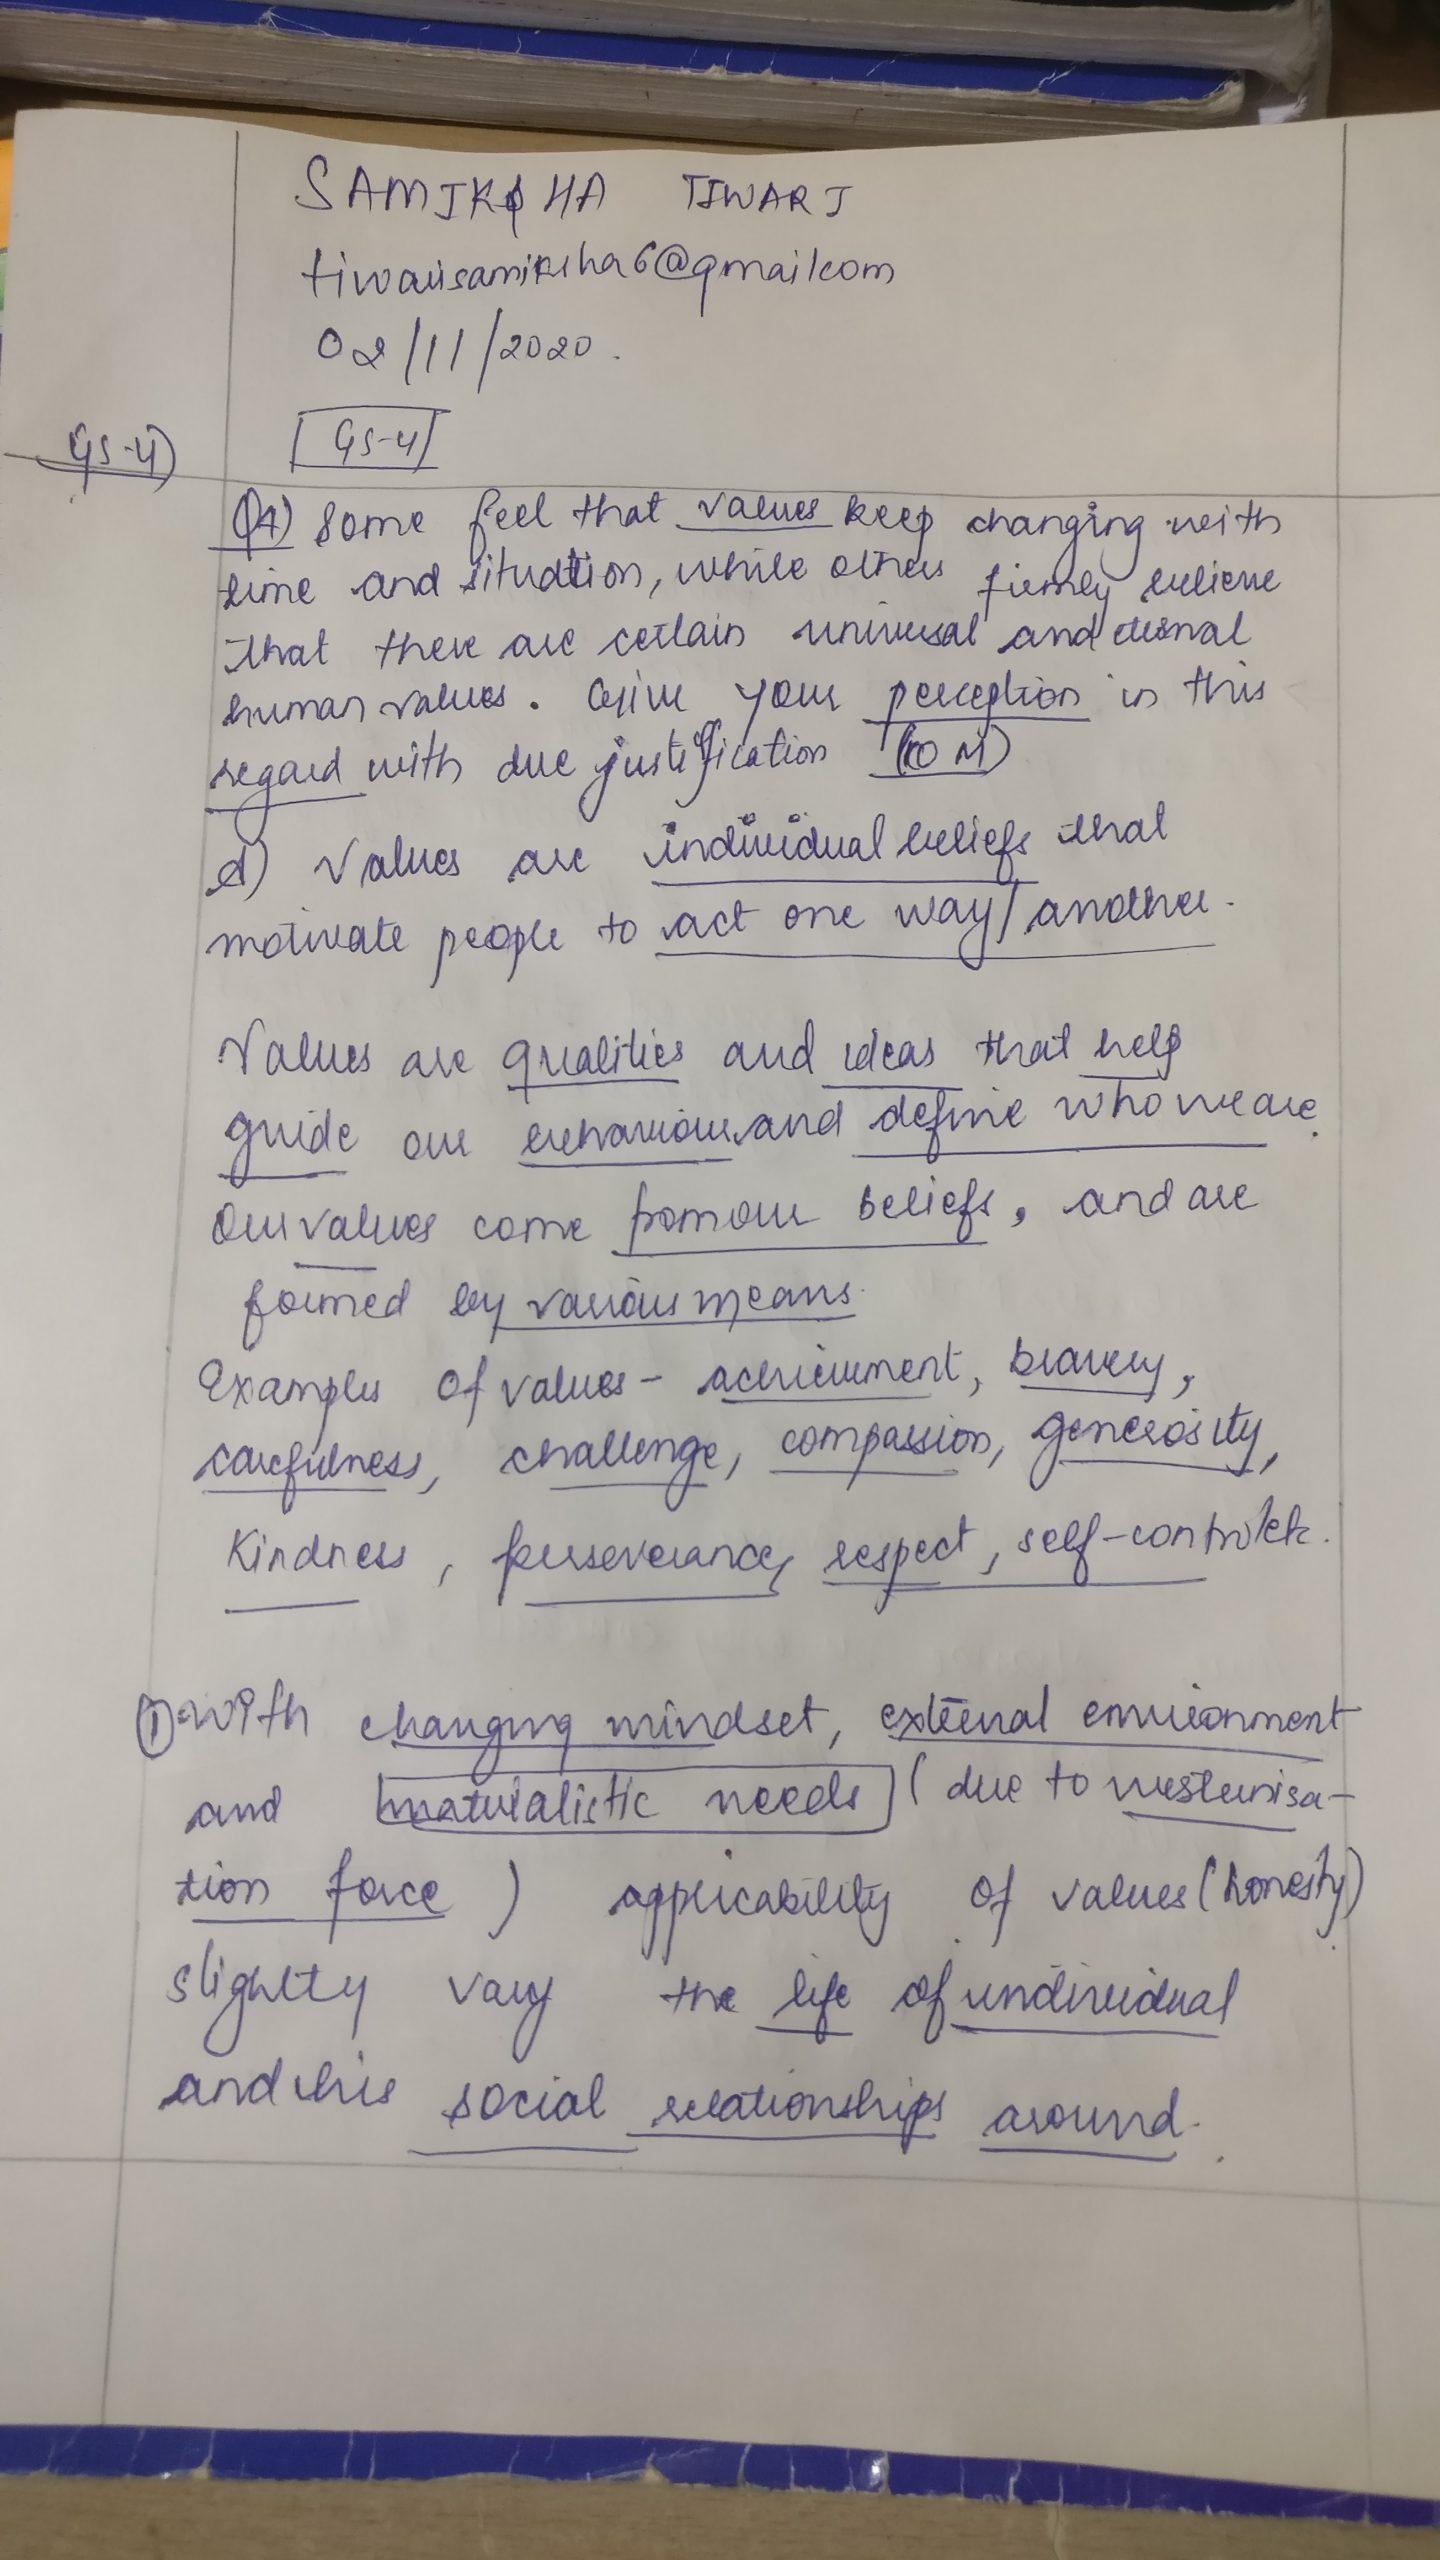 My favourite leader mahatma gandhi essay in marathi